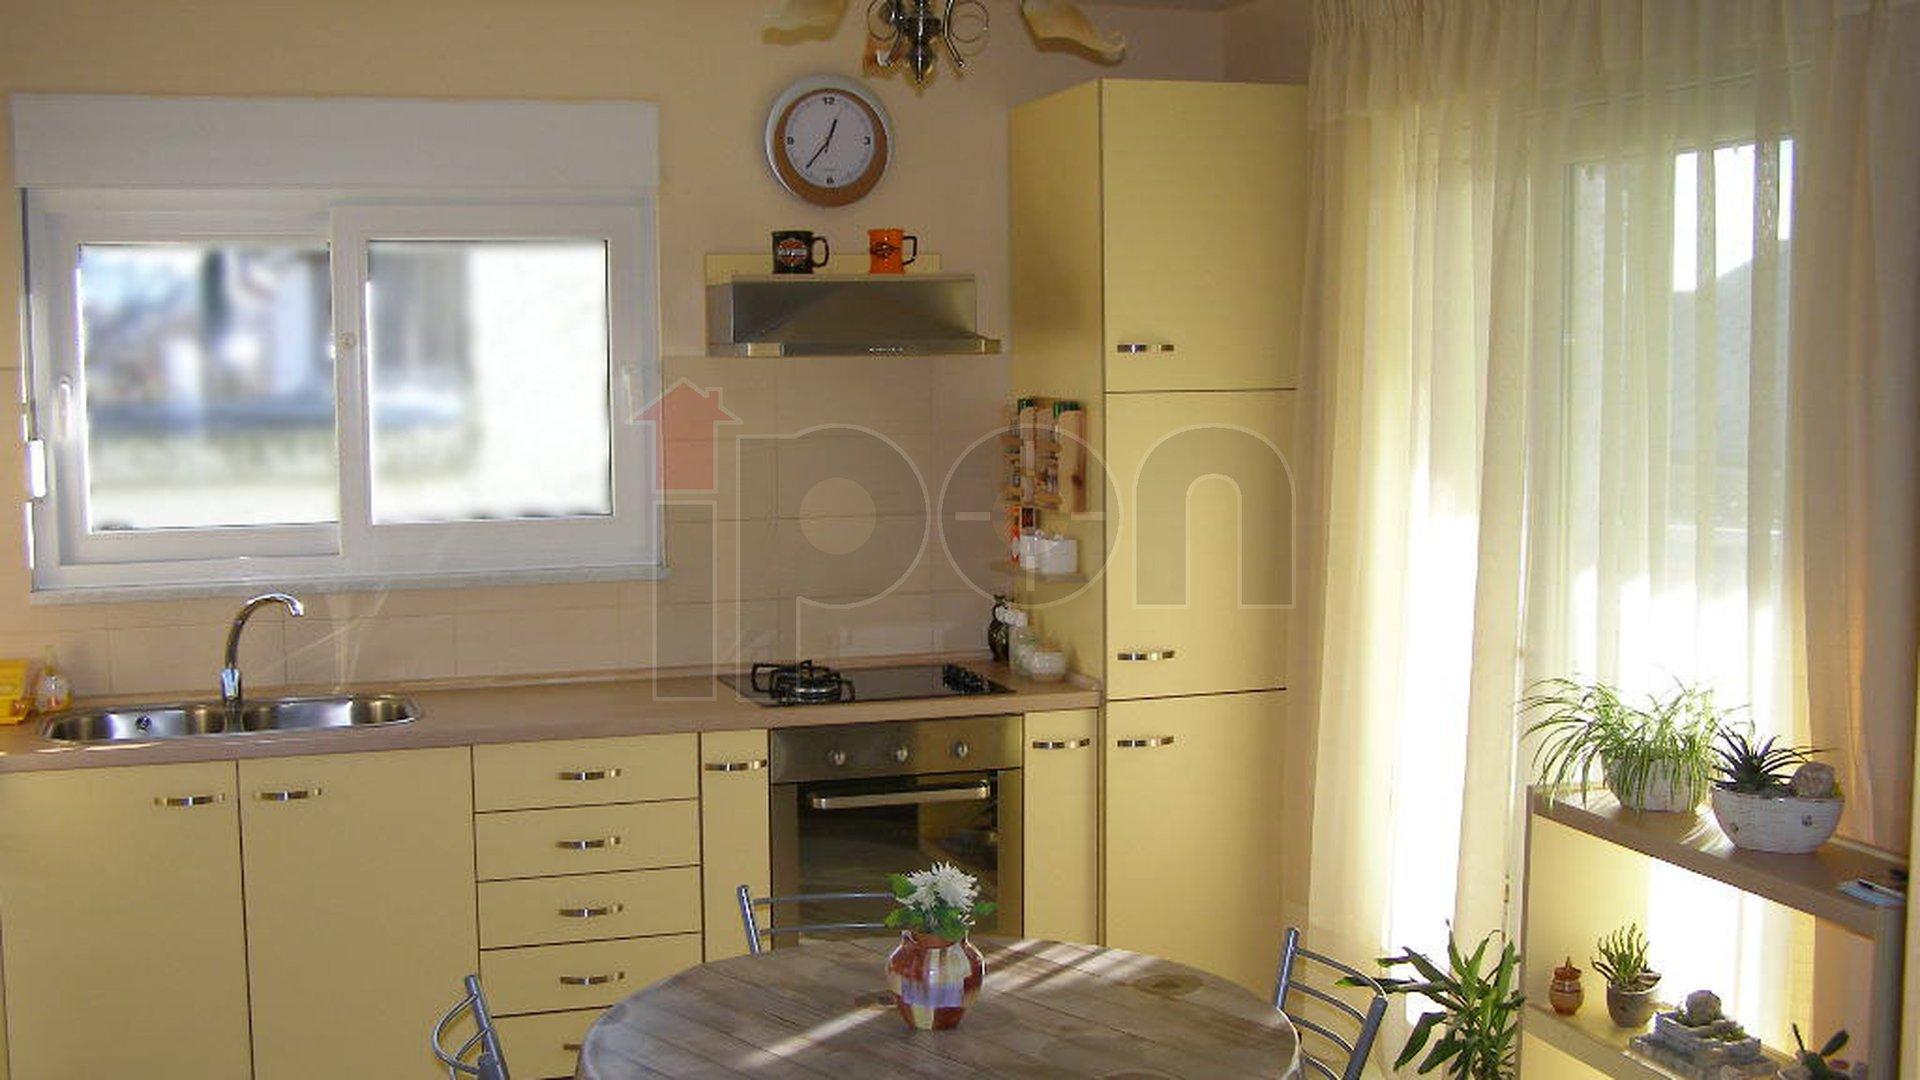 Casa, 85 m2, Vendita, Krasica